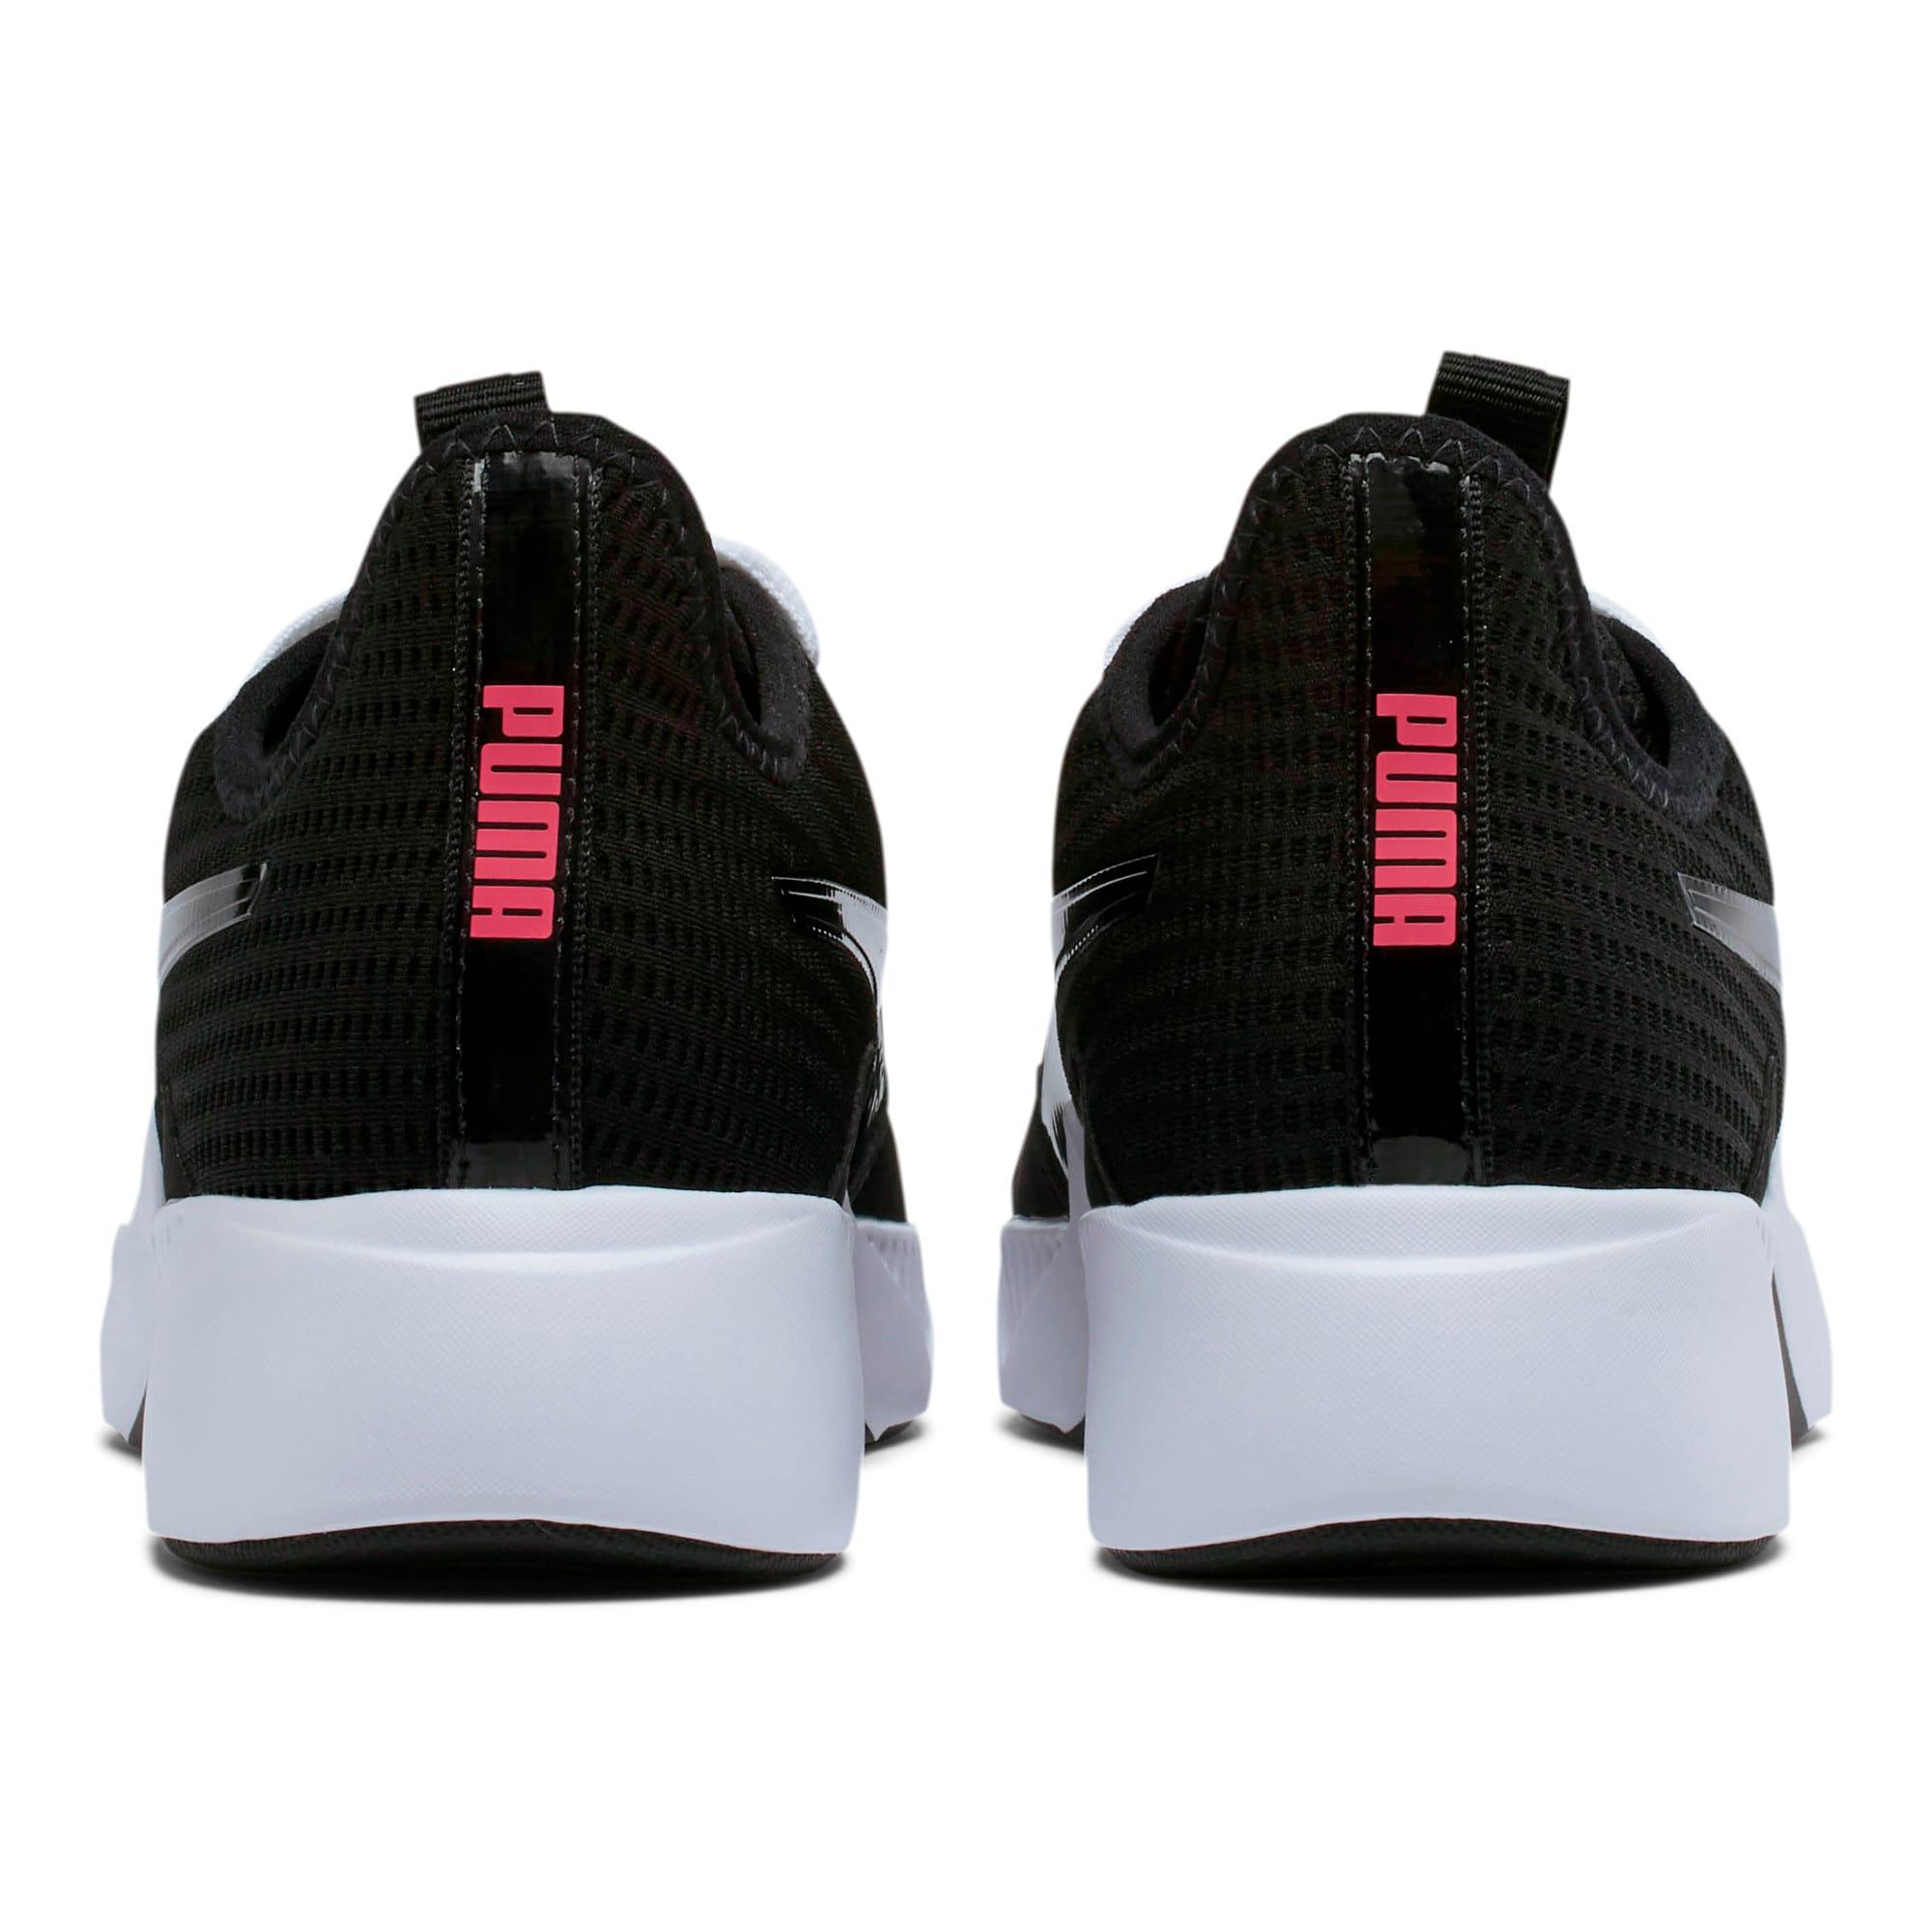 Thumbnail 4 of Incite FS Shift Women's Training Shoes, Puma Black-Nrgy Rose, medium